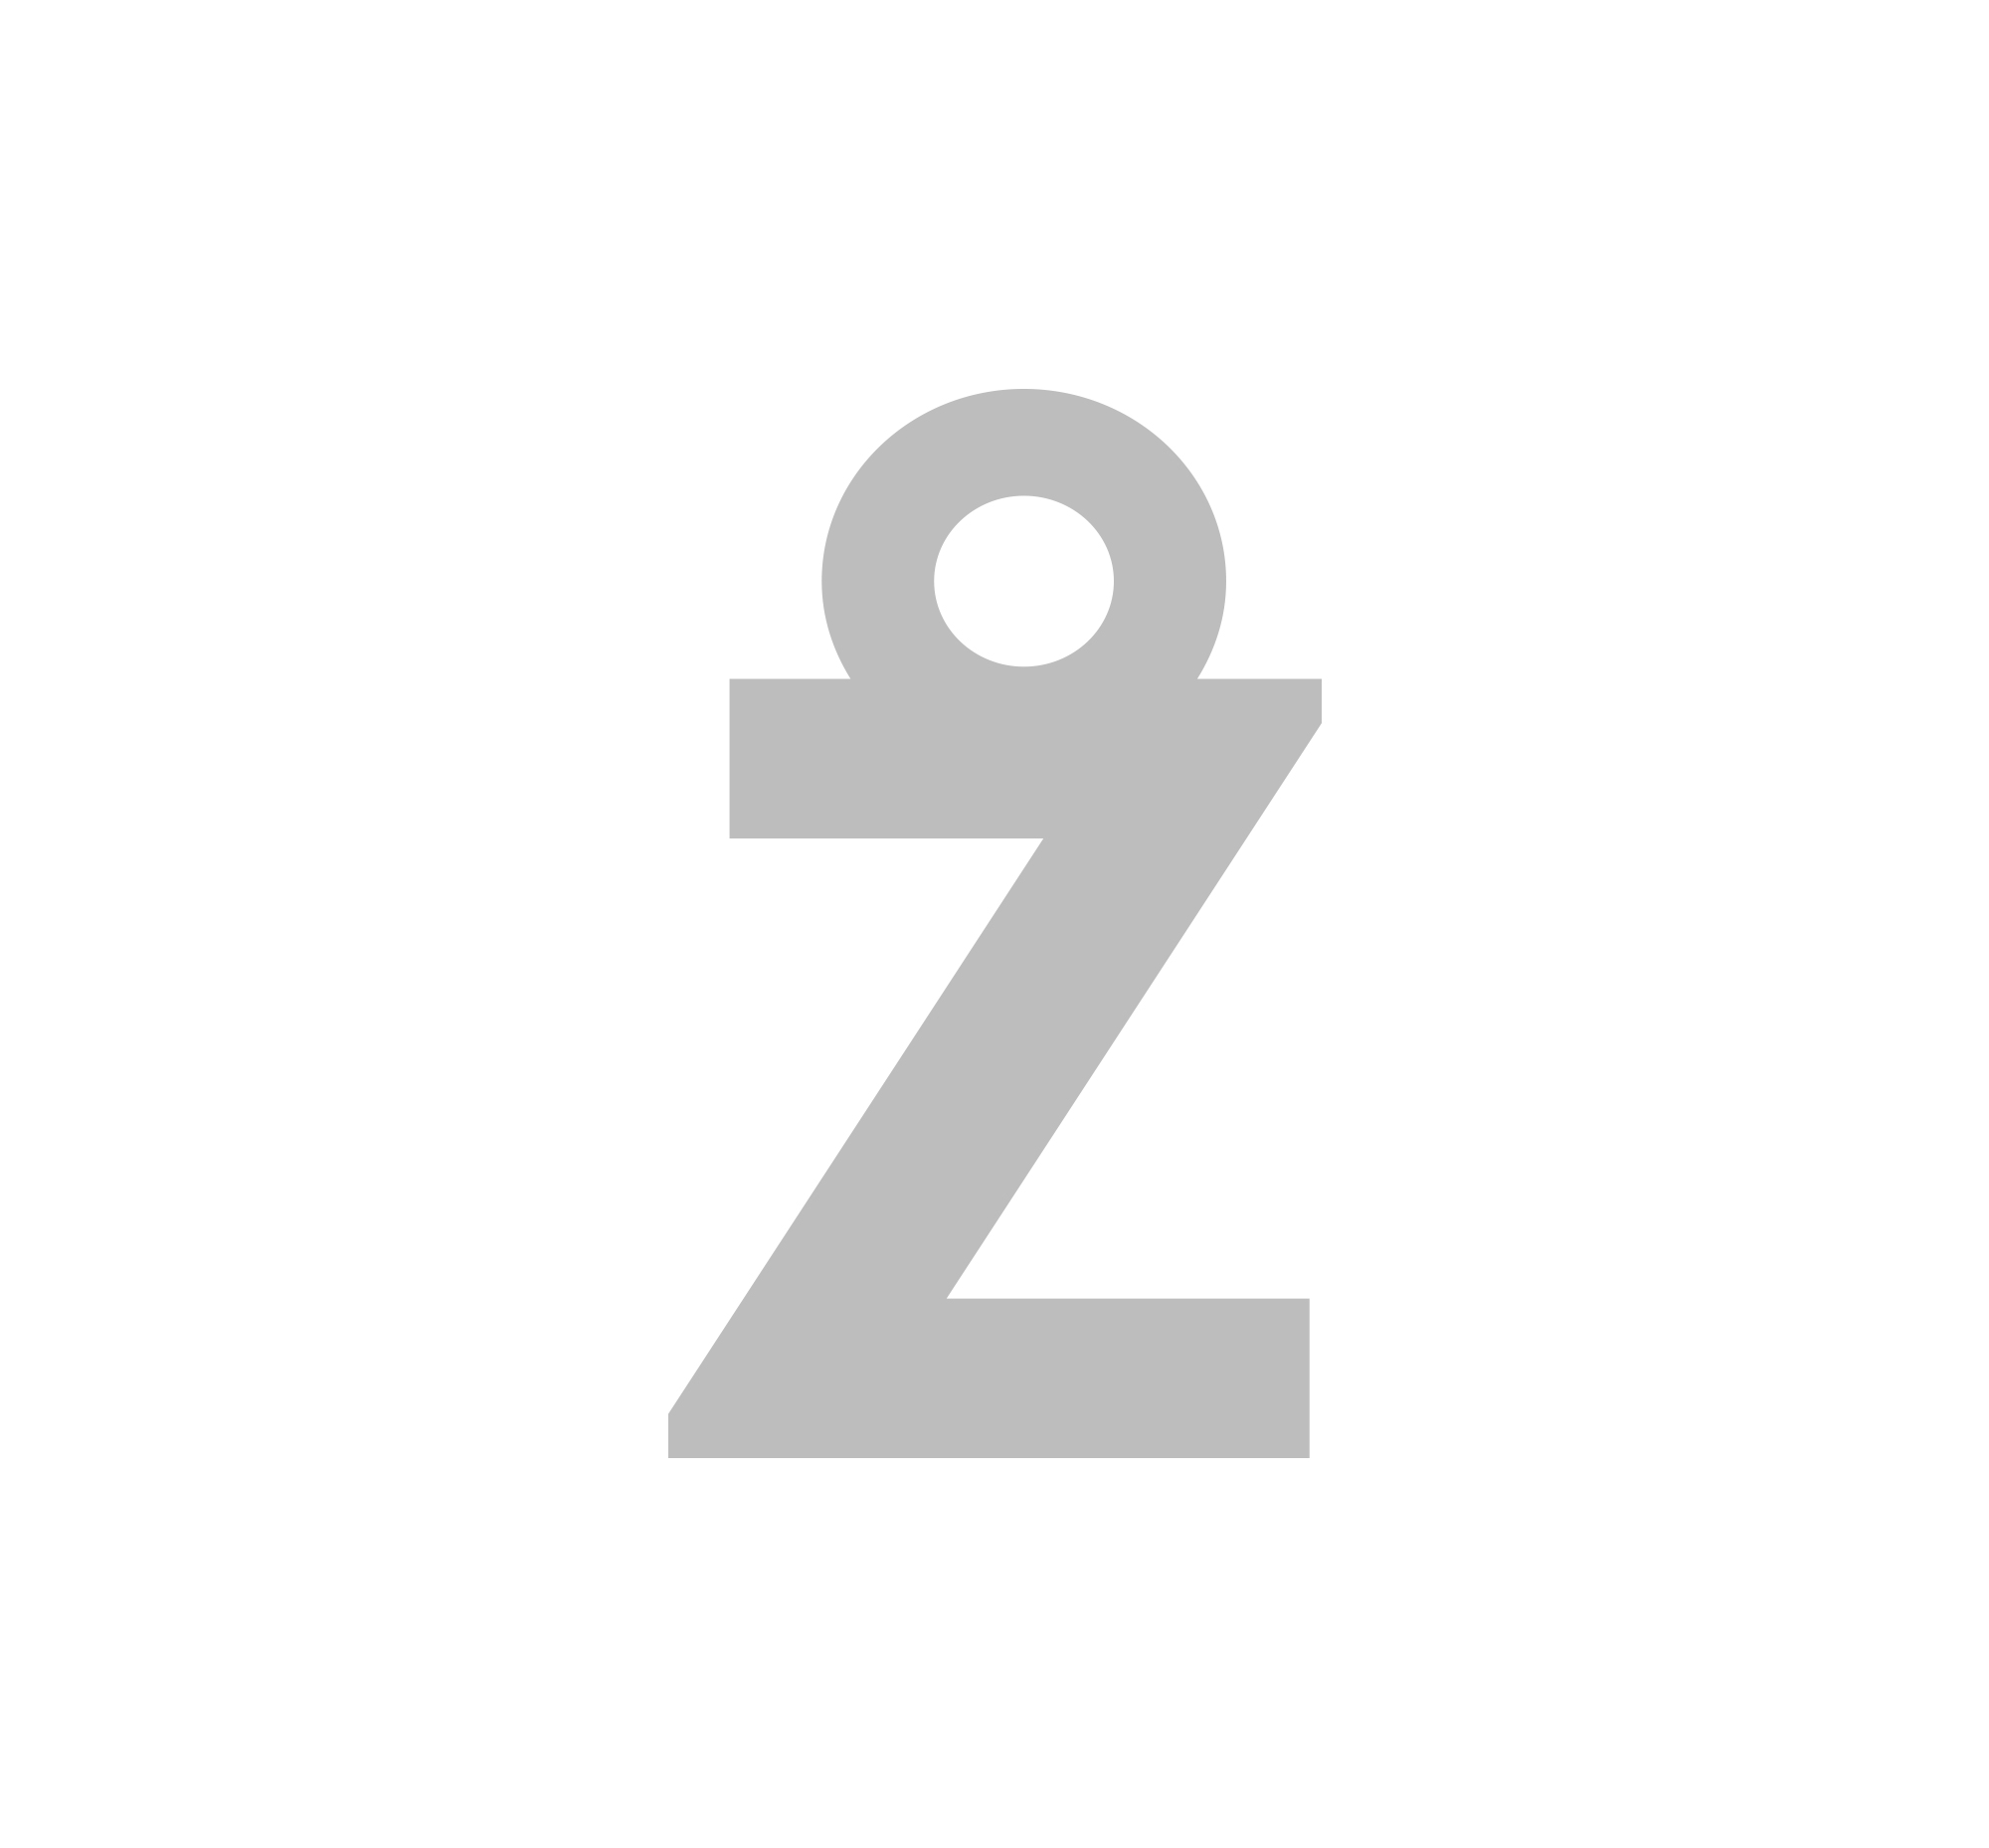 chaingang_TAS_Z-s